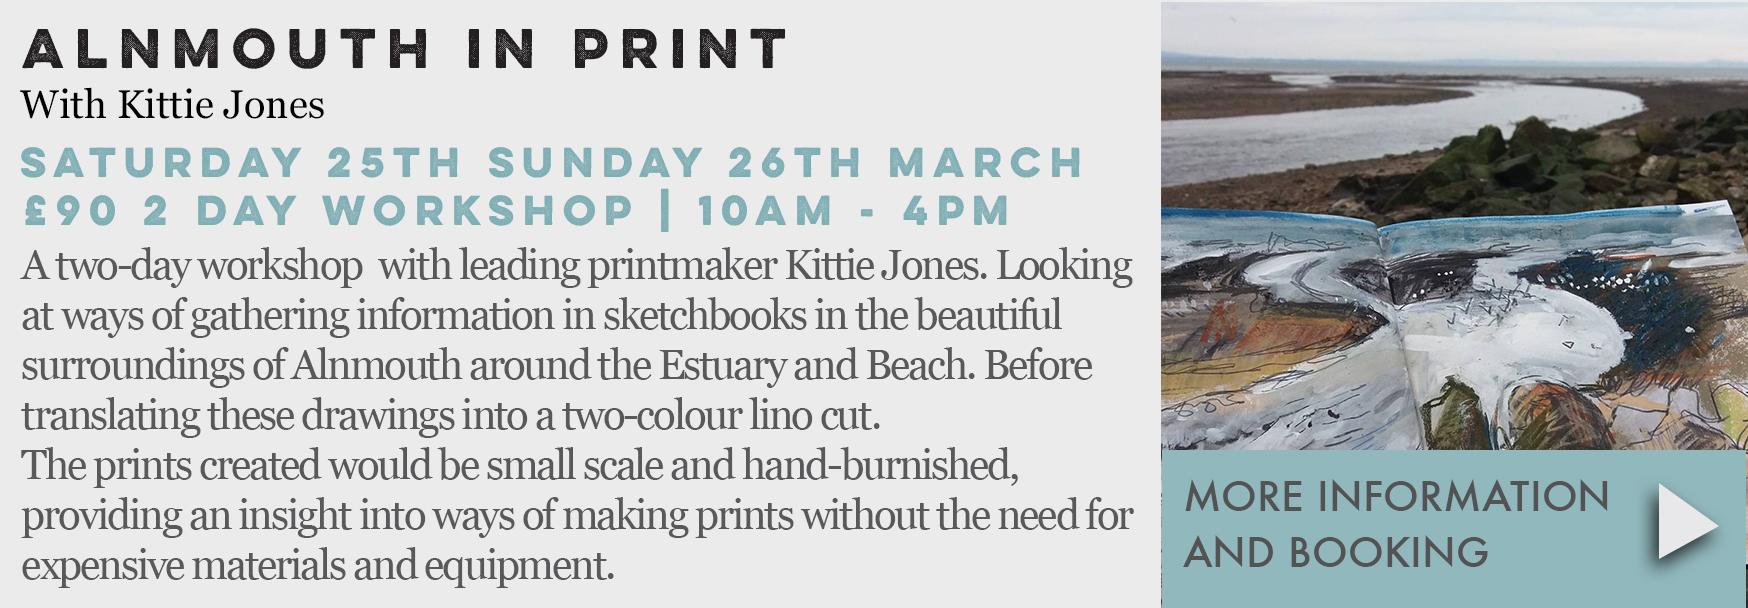 art_workshops_printing_northumberland_art_newcastle_exhibition_alnmouth_northumberland